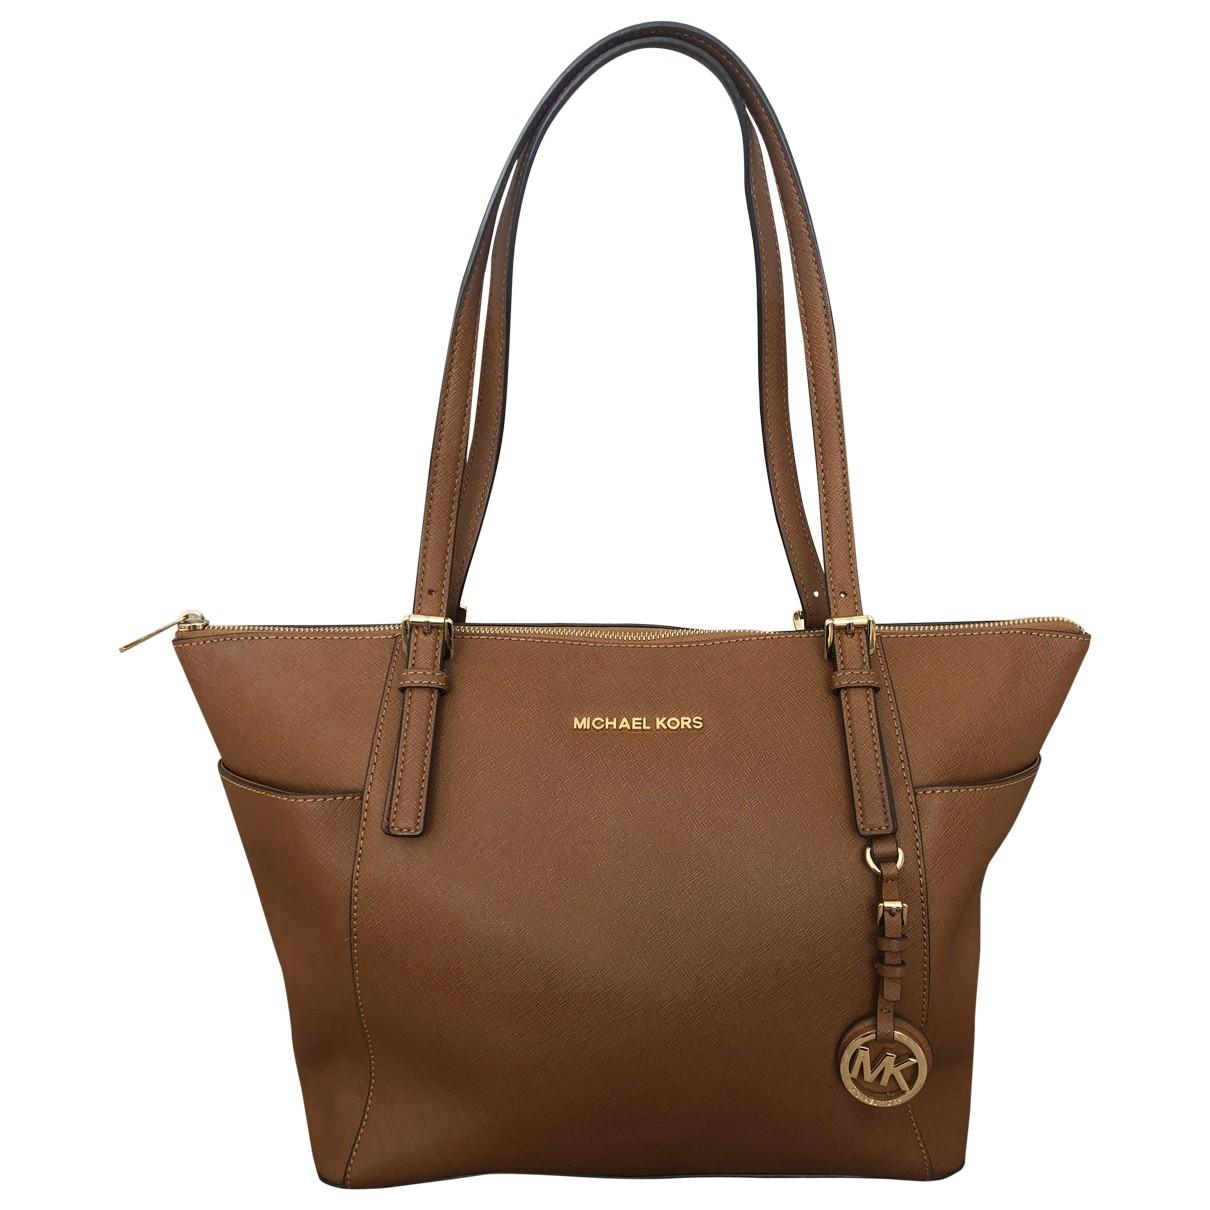 Michael Kors Jet Set Camel Leather handbag for Women \N